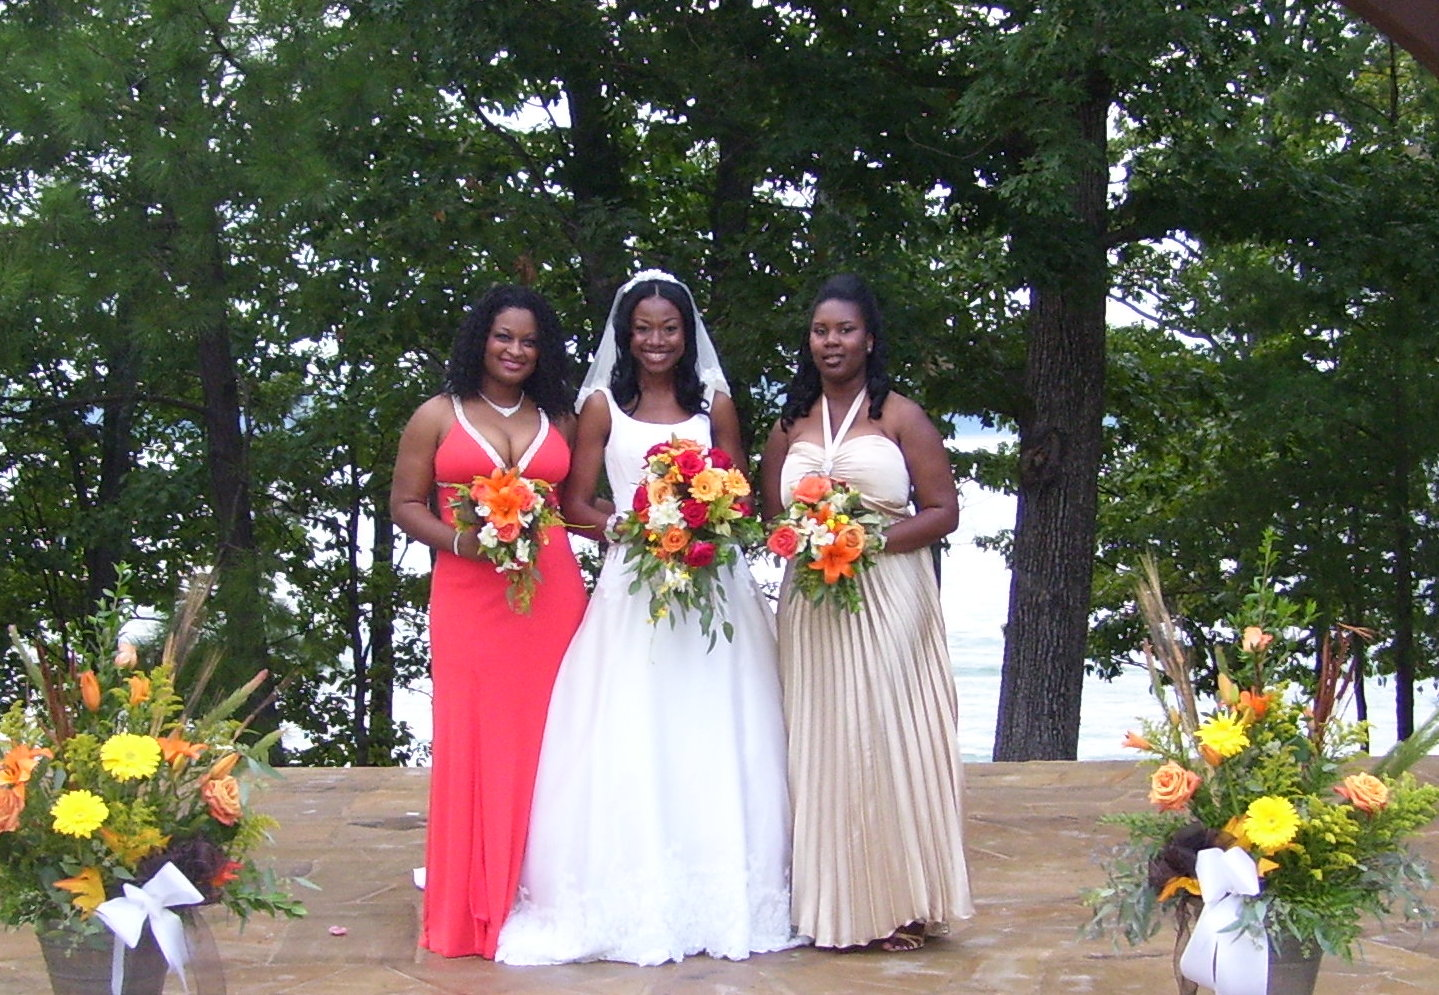 Wedding Flowers Bridal Bouquets Rentals